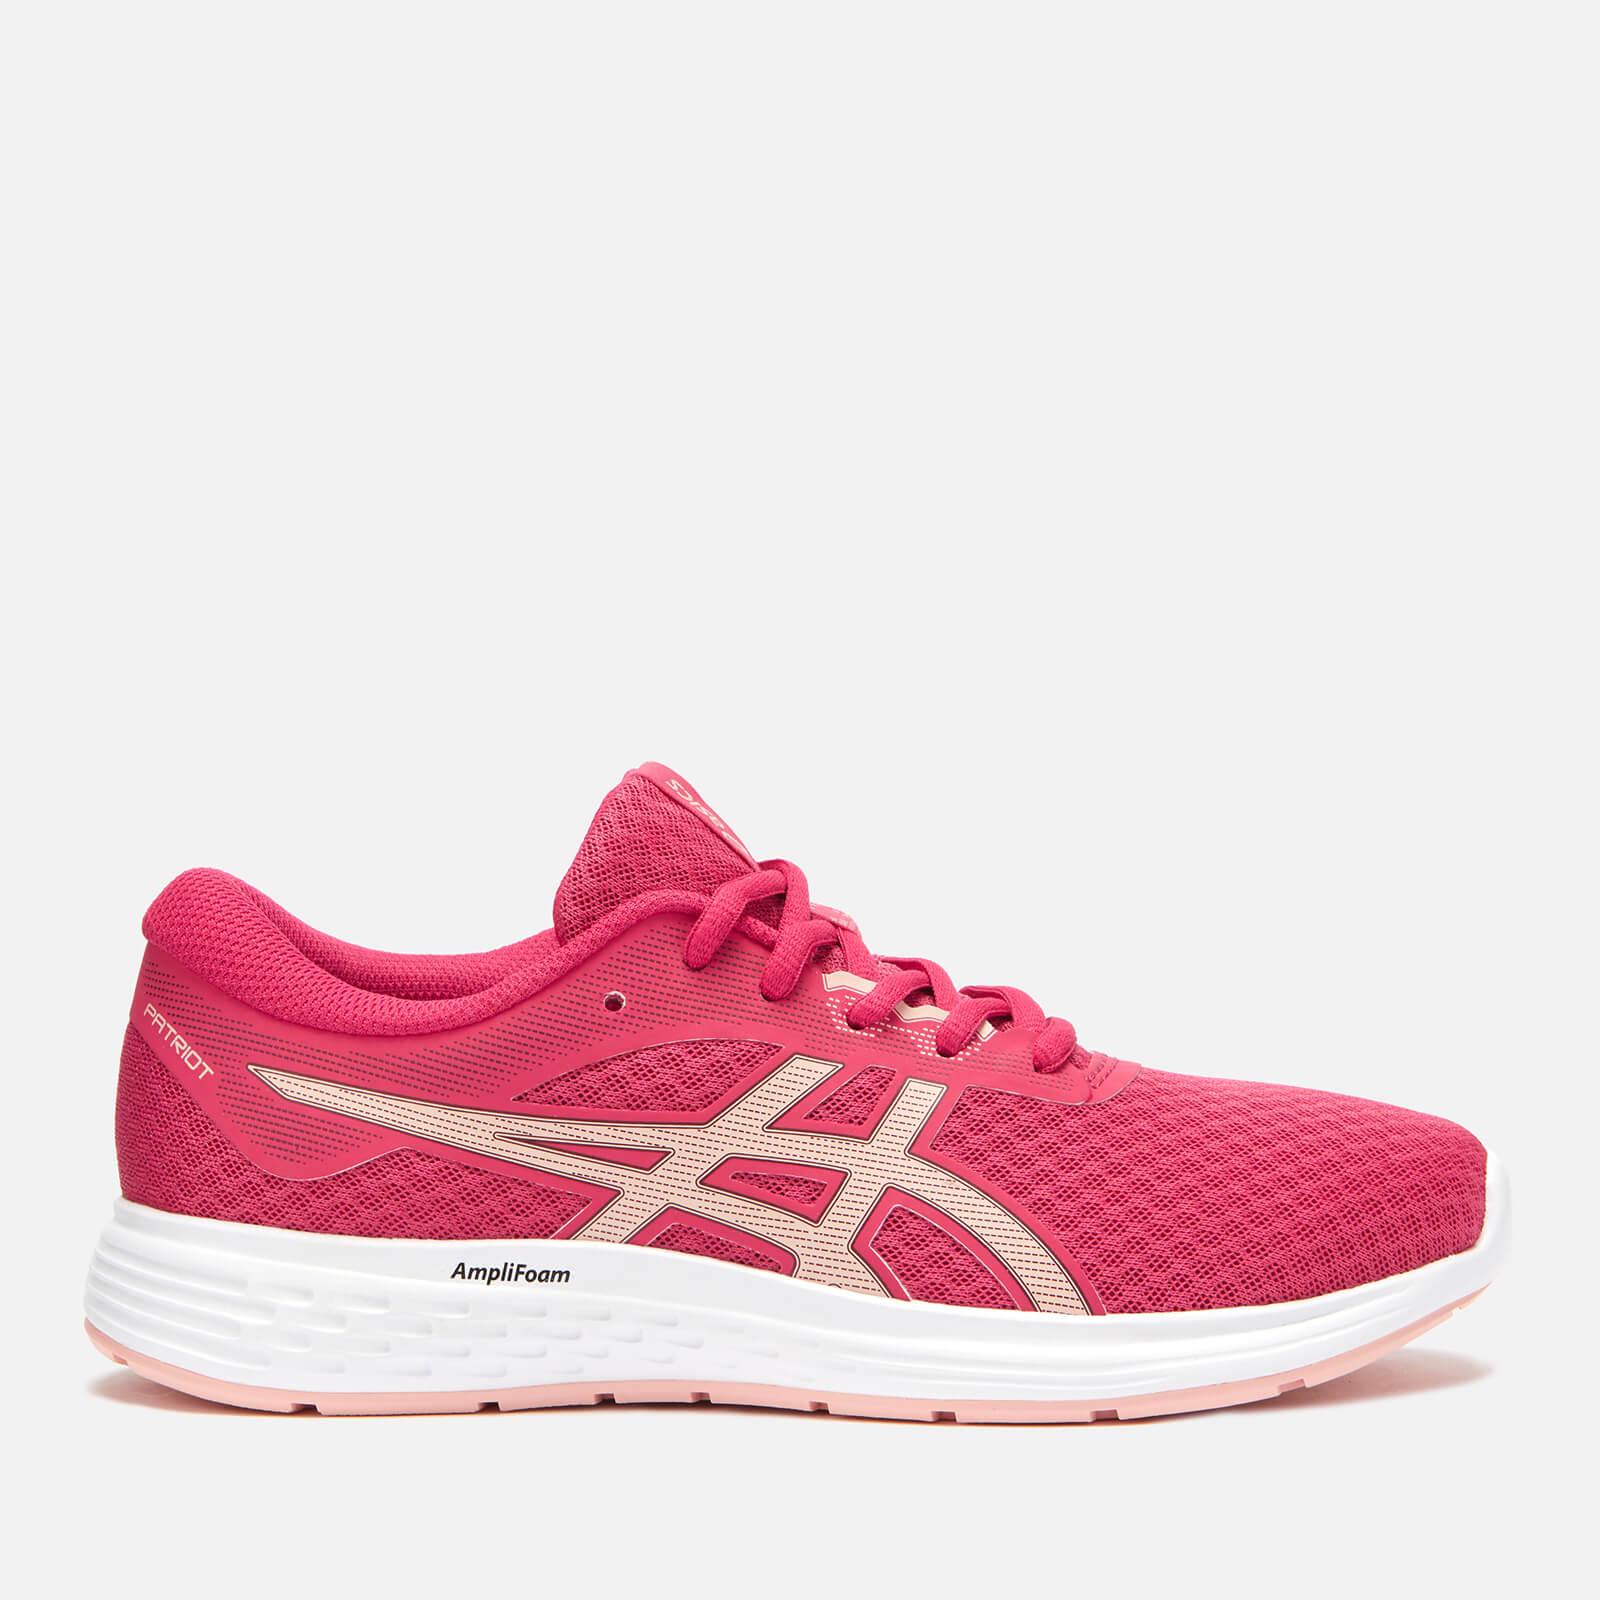 Asics Women's Running Patriot 11 Trainers - Rose Petal/Breeze - UK 5 - Pink